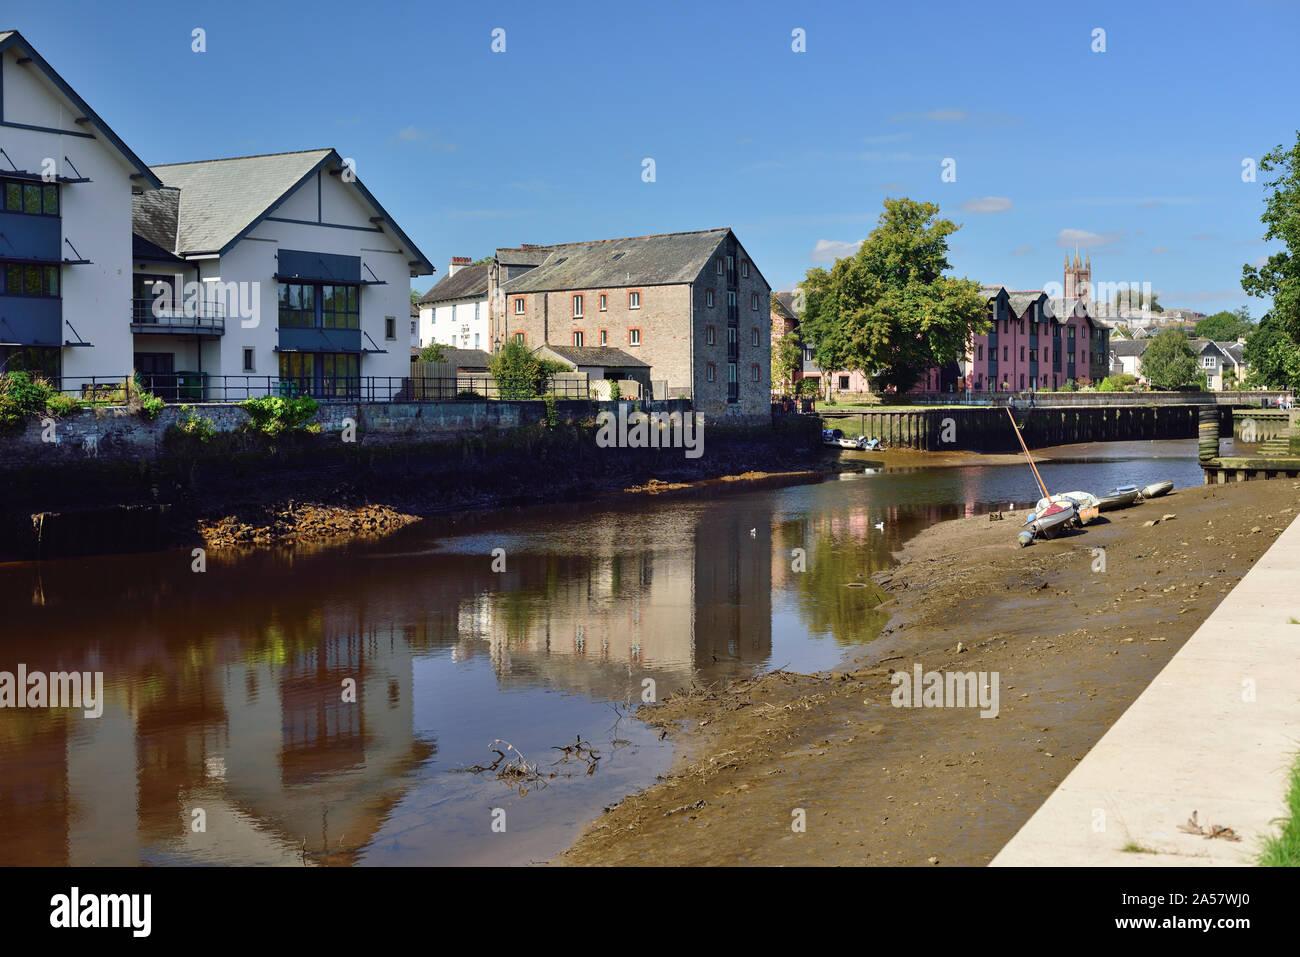 Riverside buildings in Totnes, Devon, at low tide. Stock Photo